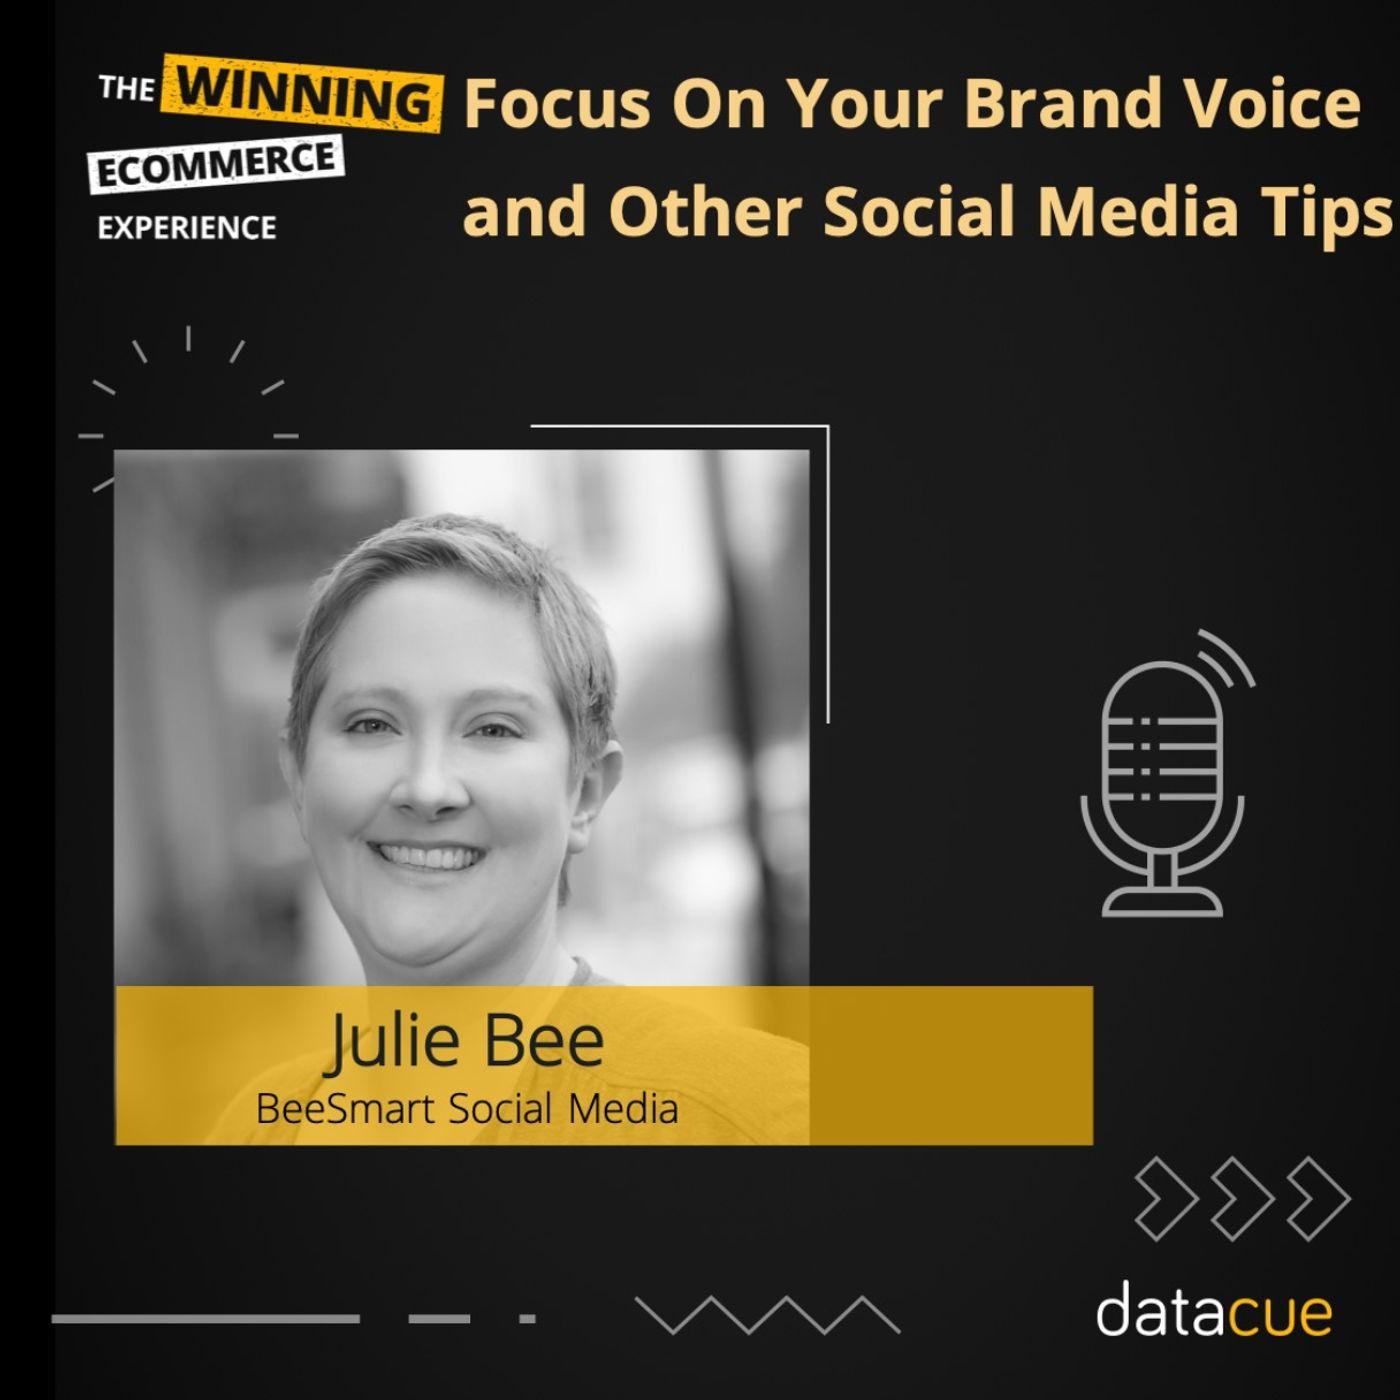 Julie Bee